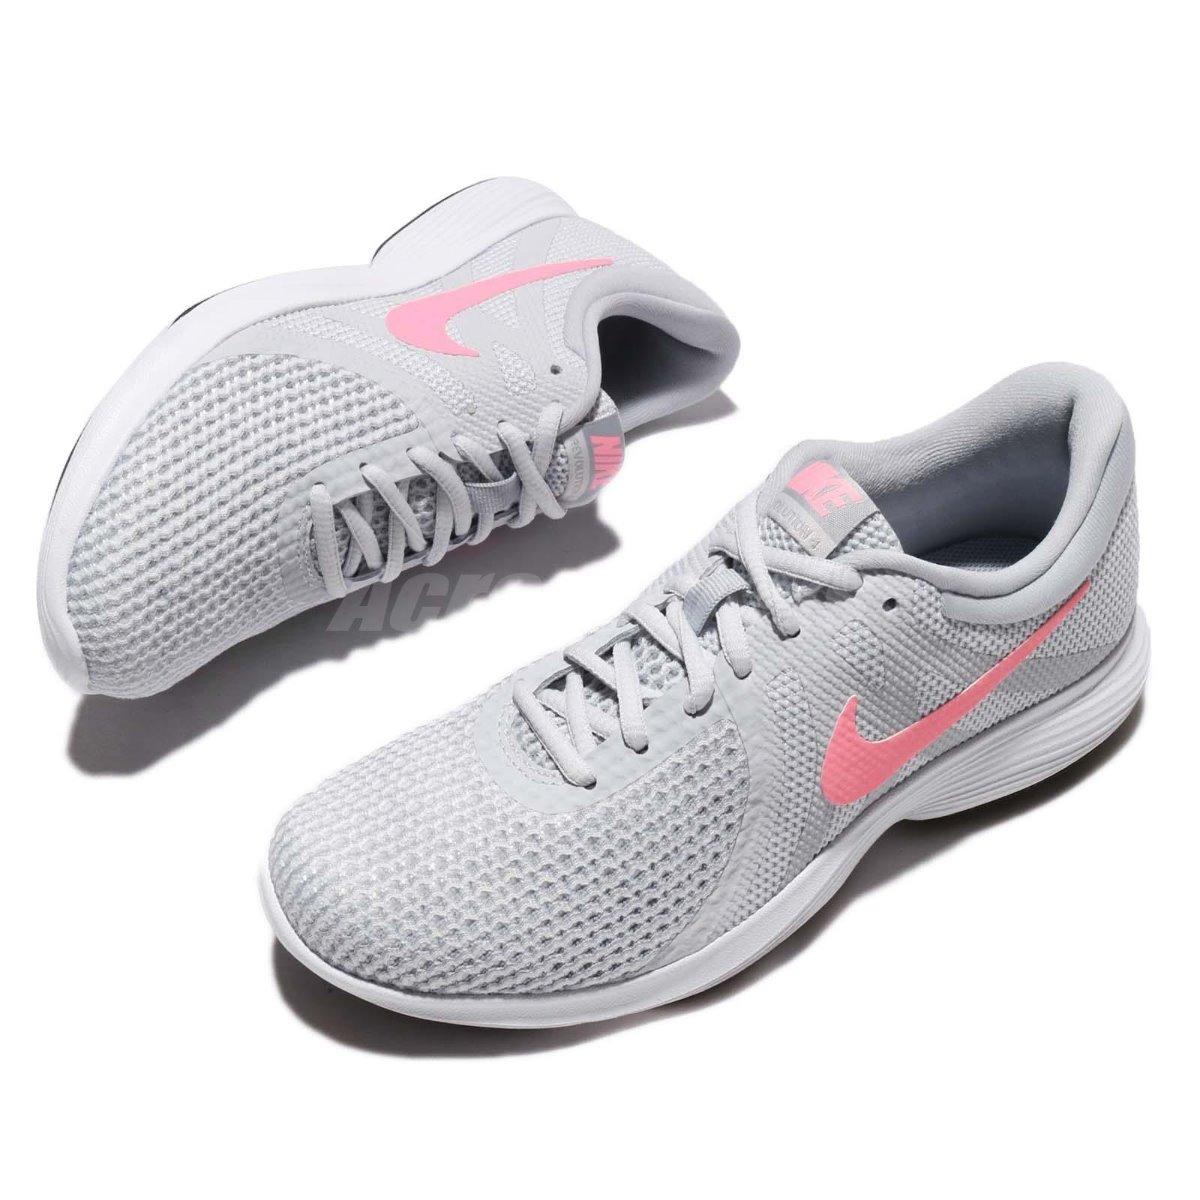 e8dcac5092f18 tenis nike revolution gris rosa mujer 100% 908999-016. Cargando zoom.